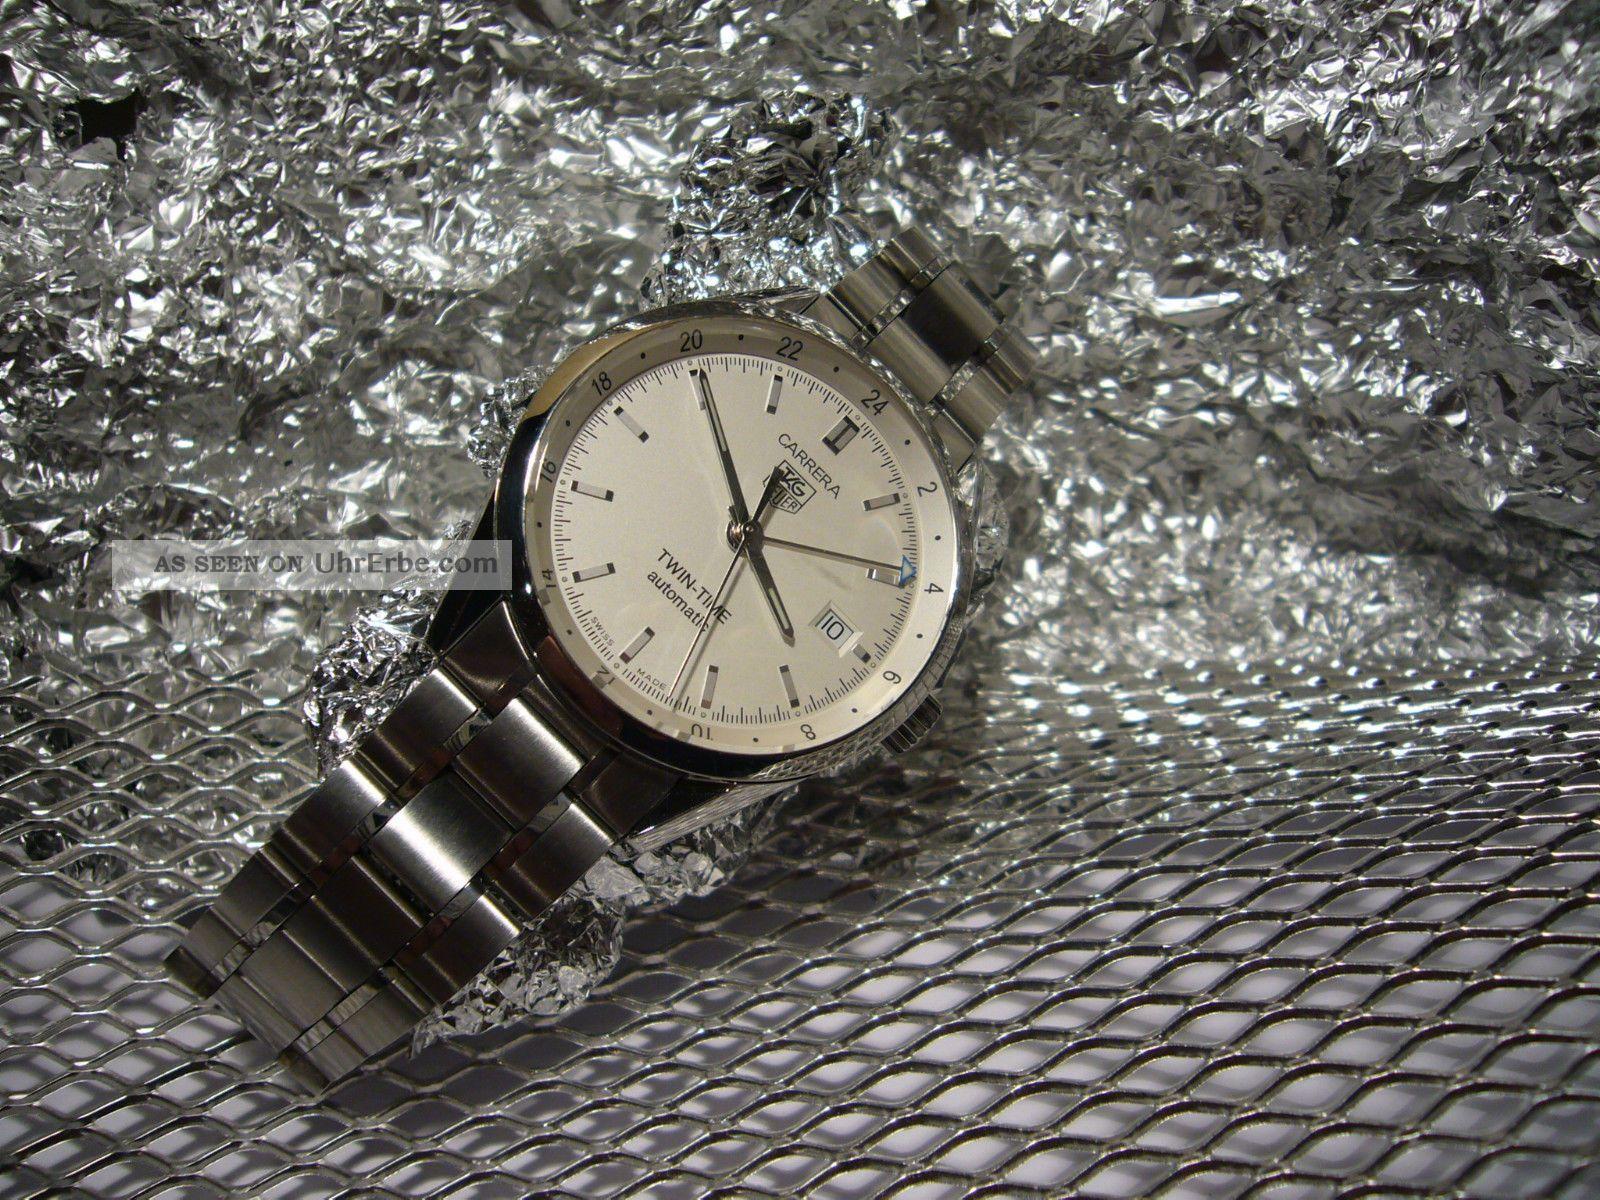 Tag Heuer Carrera Twin - Time Calibre 7 Automatik Edelstahl Armbanduhren Bild